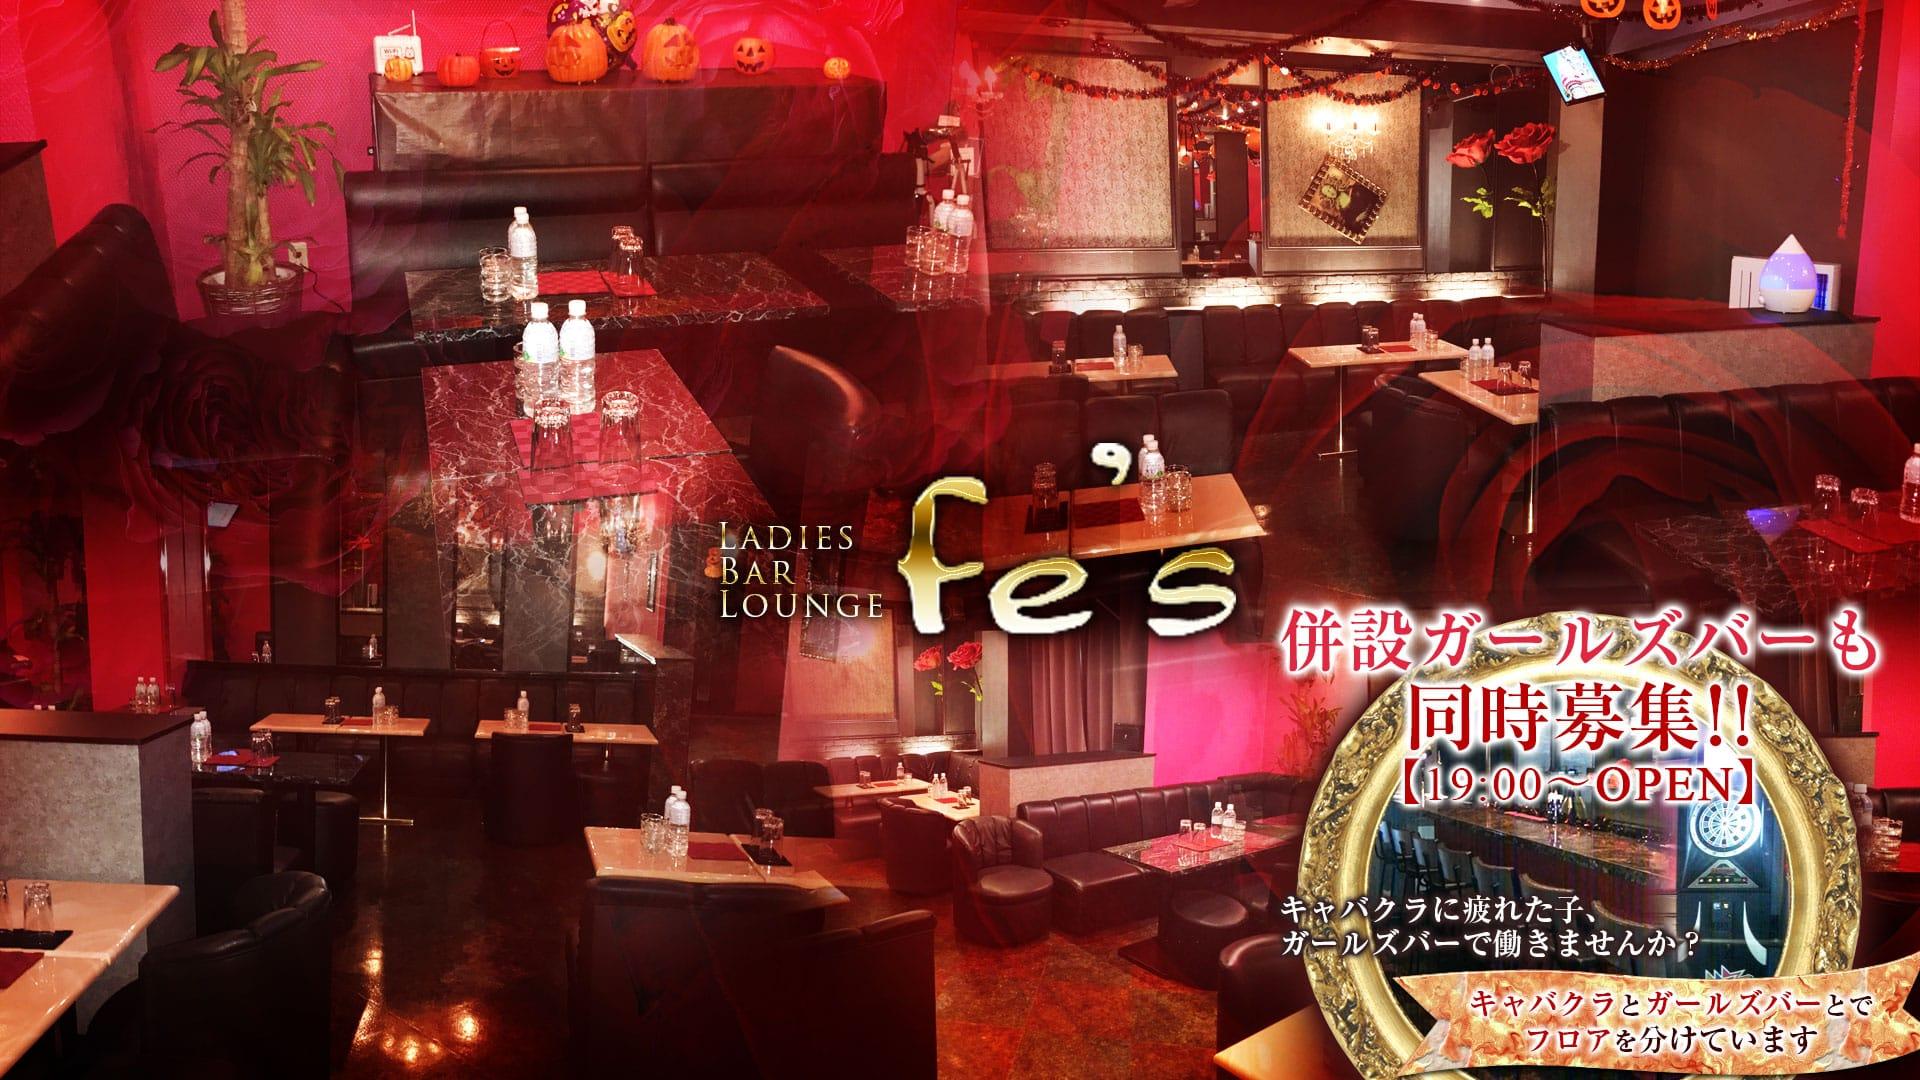 Ladies Bar Lounge Fe's~フィス~ 相模原キャバクラ TOP画像